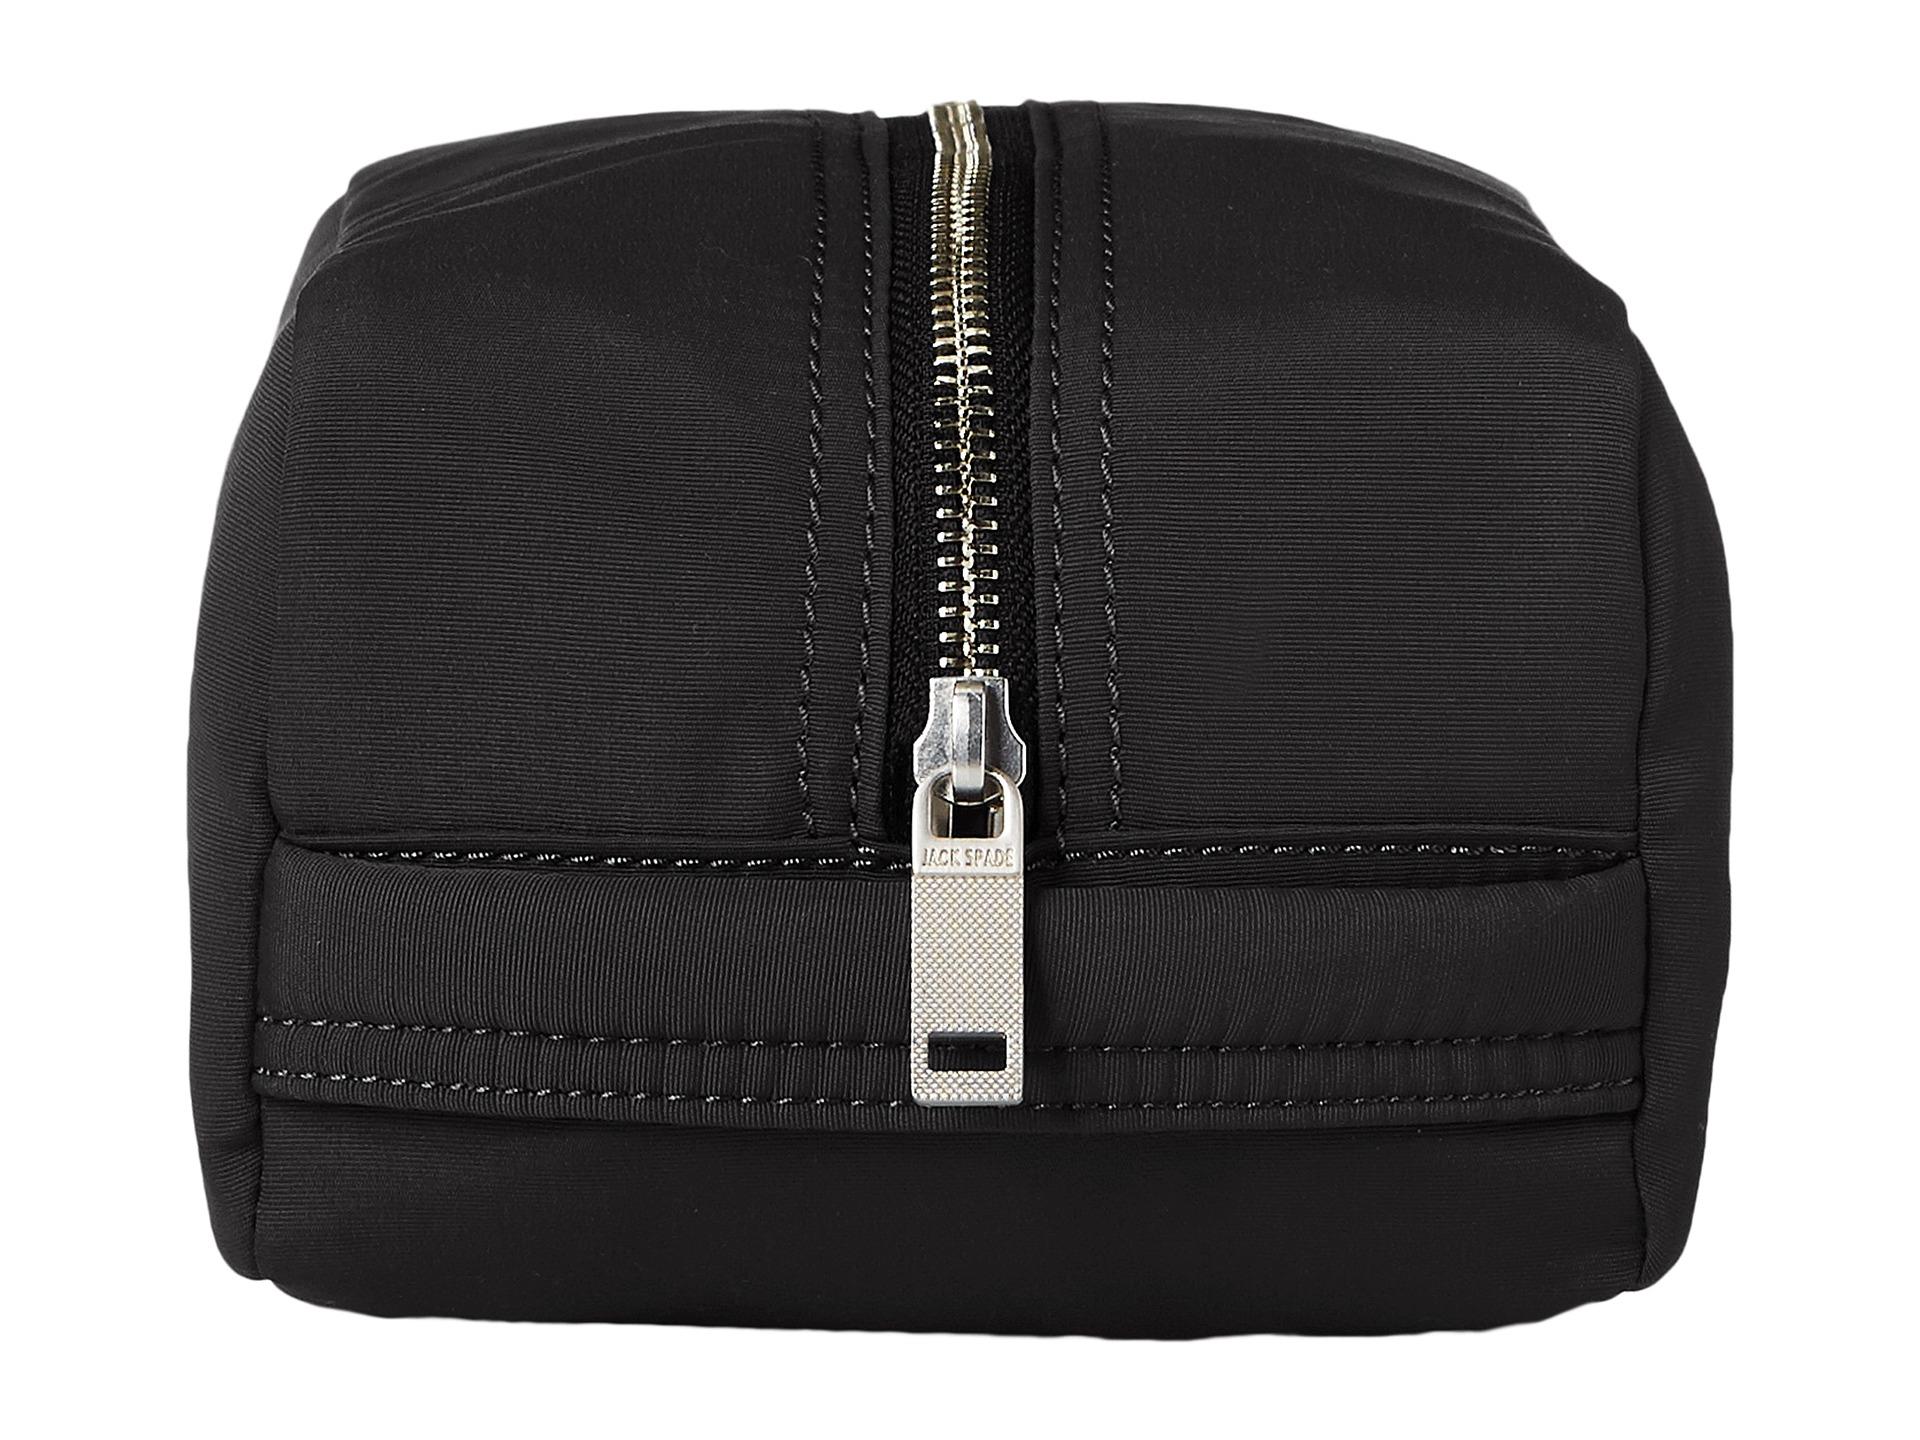 b04bf9d9ad16 Lyst - Jack Spade Tech Nylon Toiletry Kit in Black for Men